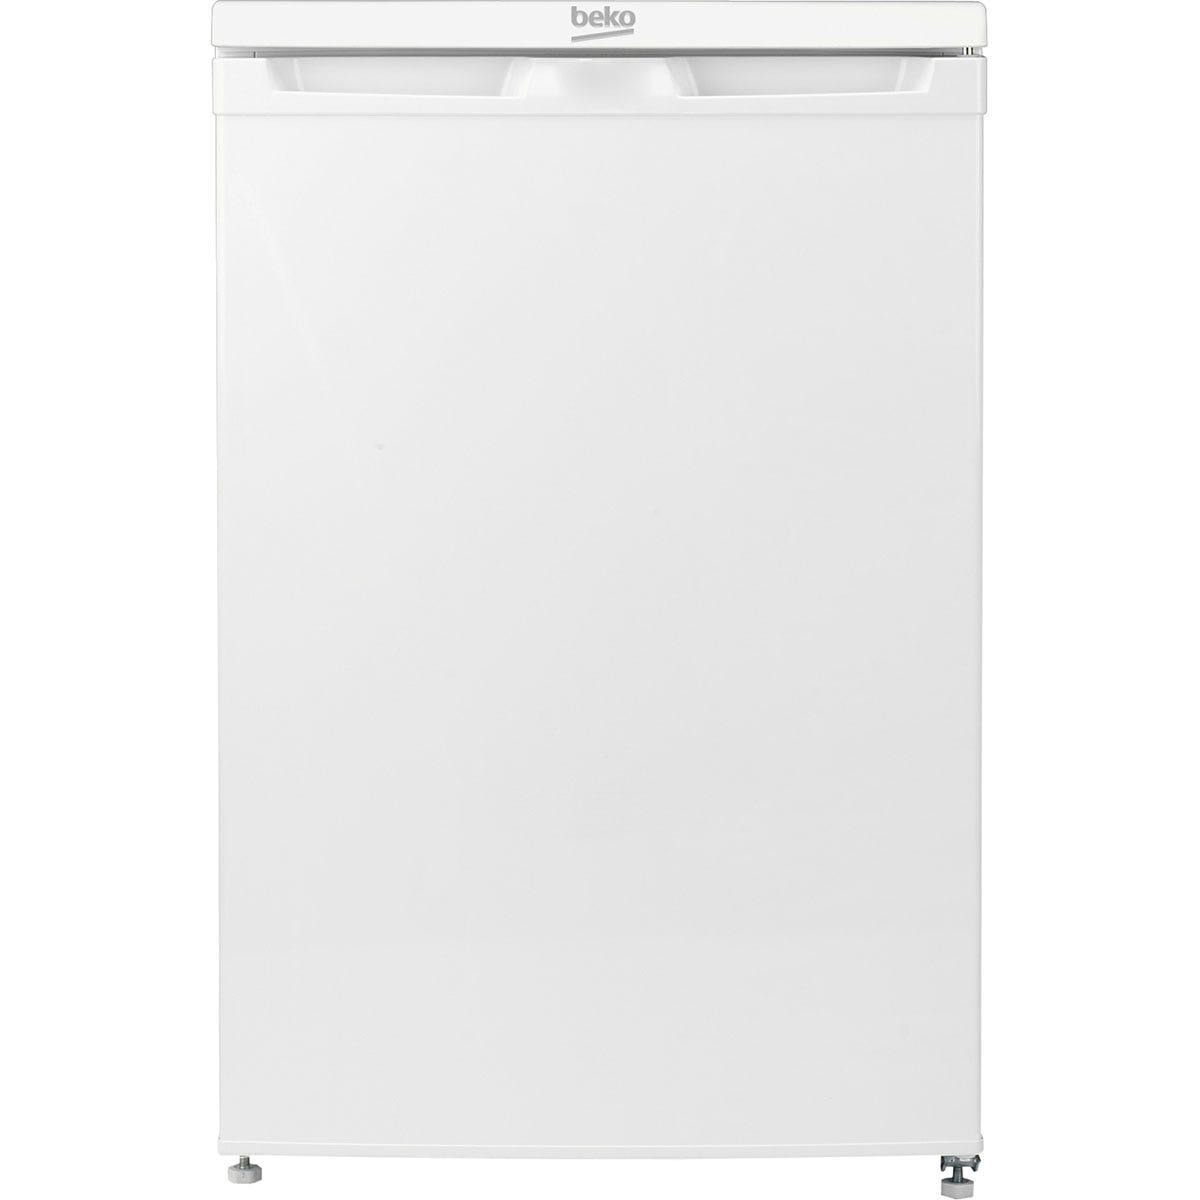 Beko UF584APW 85L Freestanding Under Counter Freezer - White